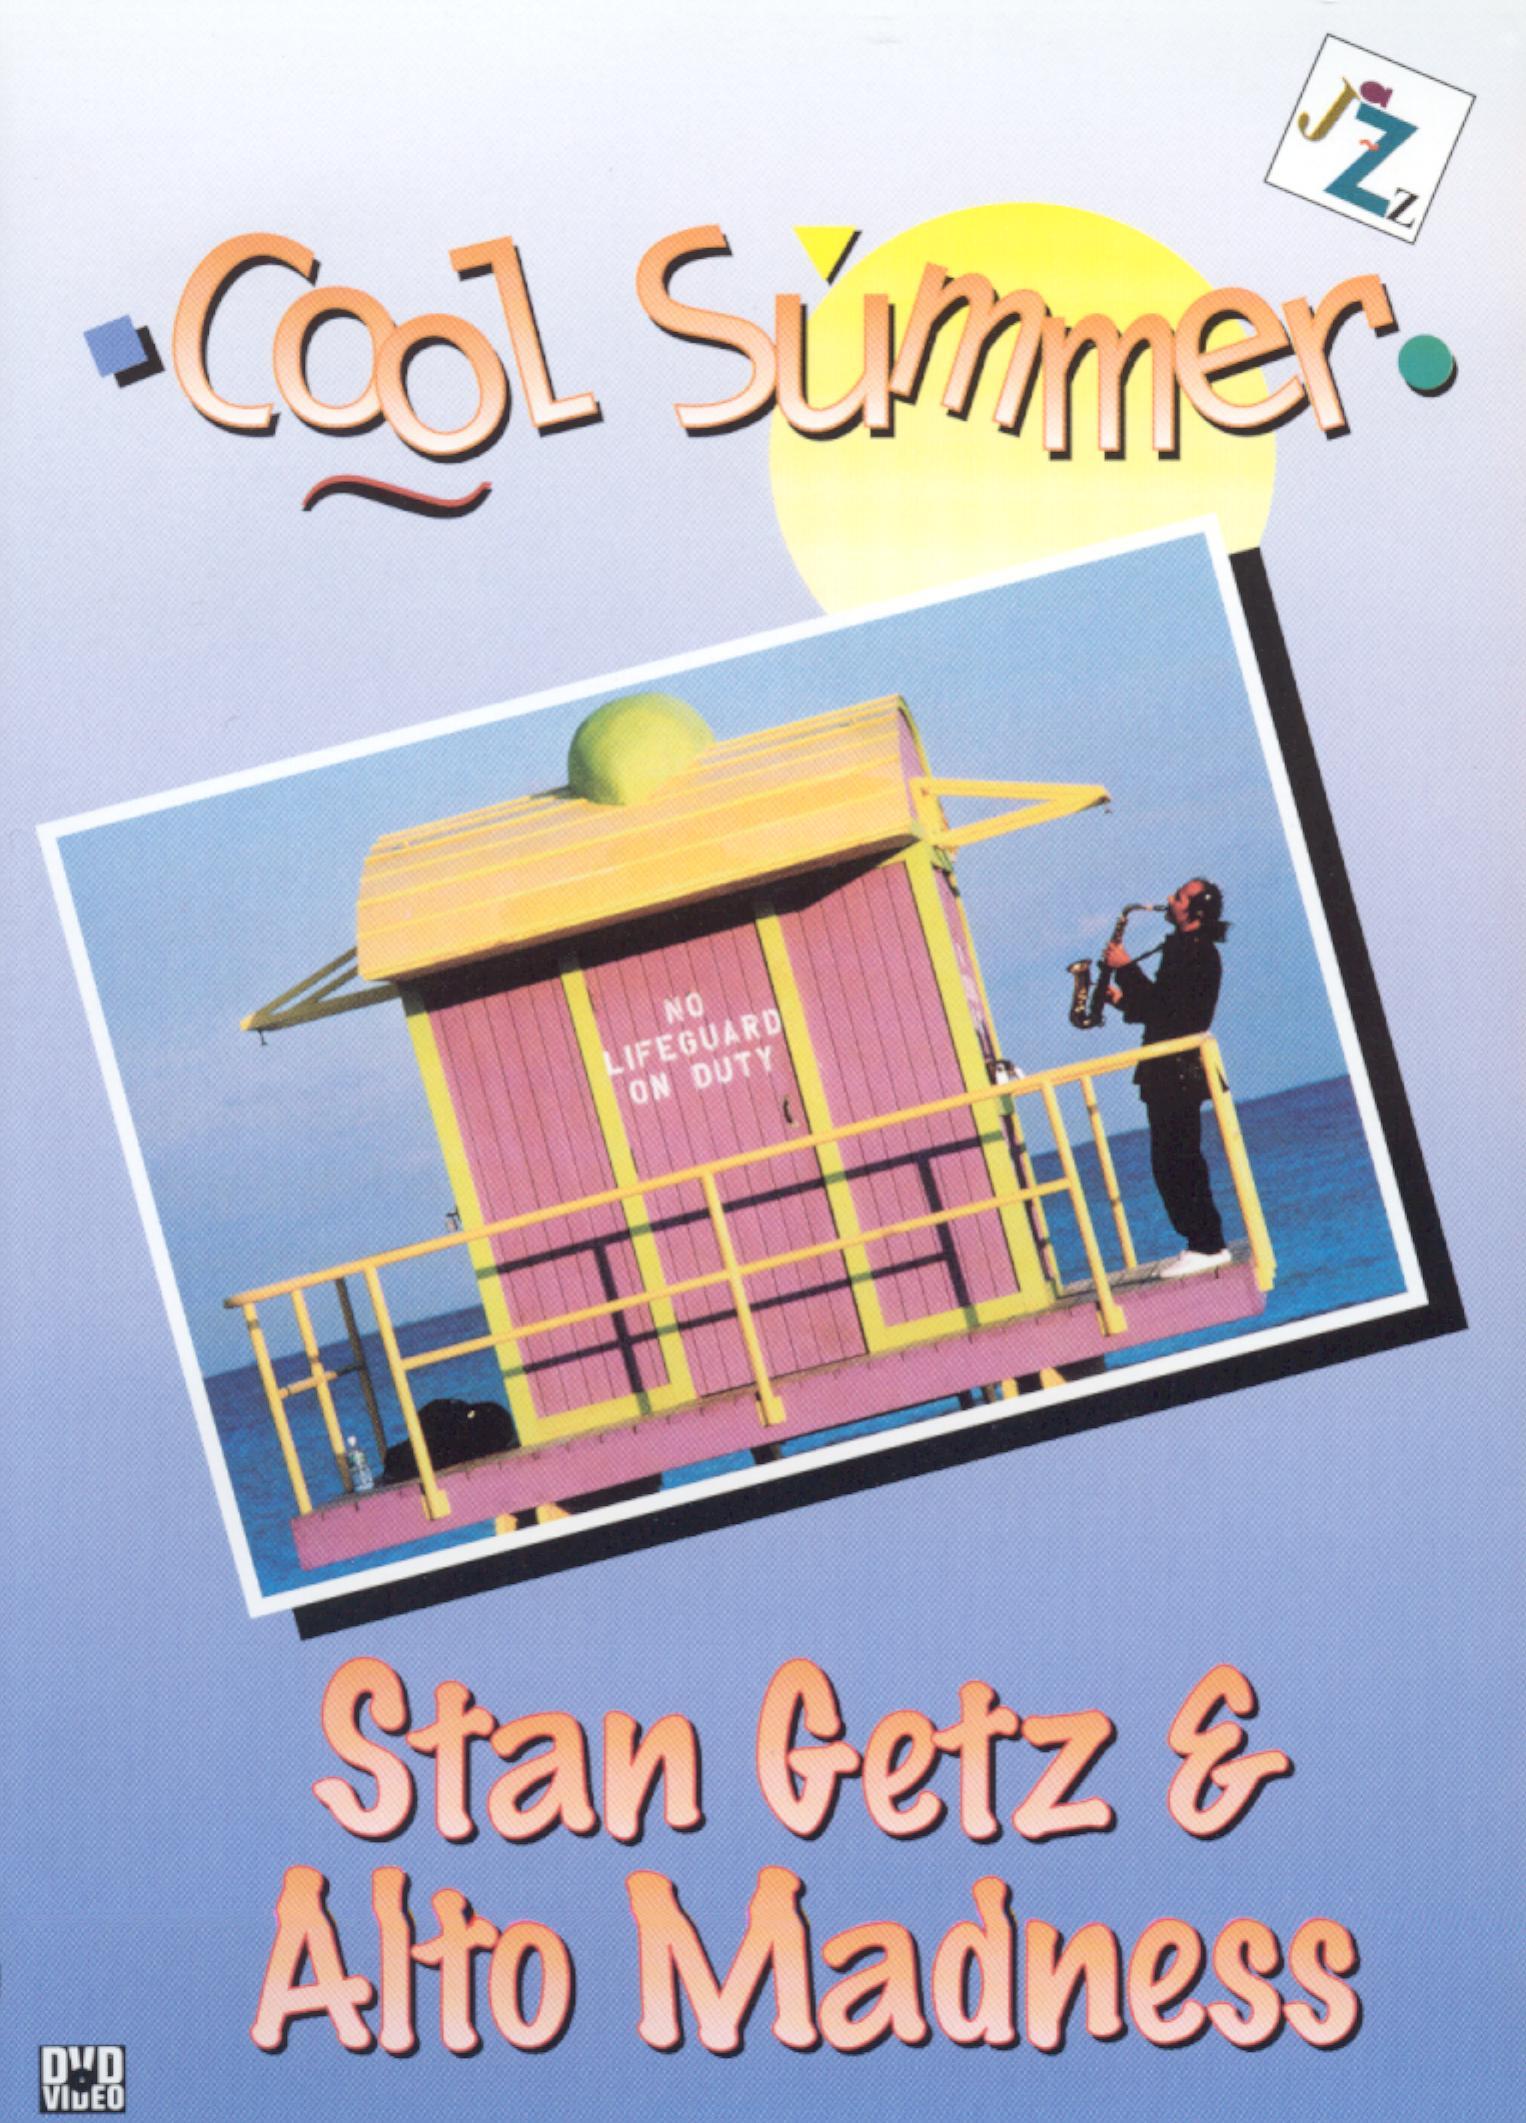 Stan Getz: Alto Madness - Cool Summer